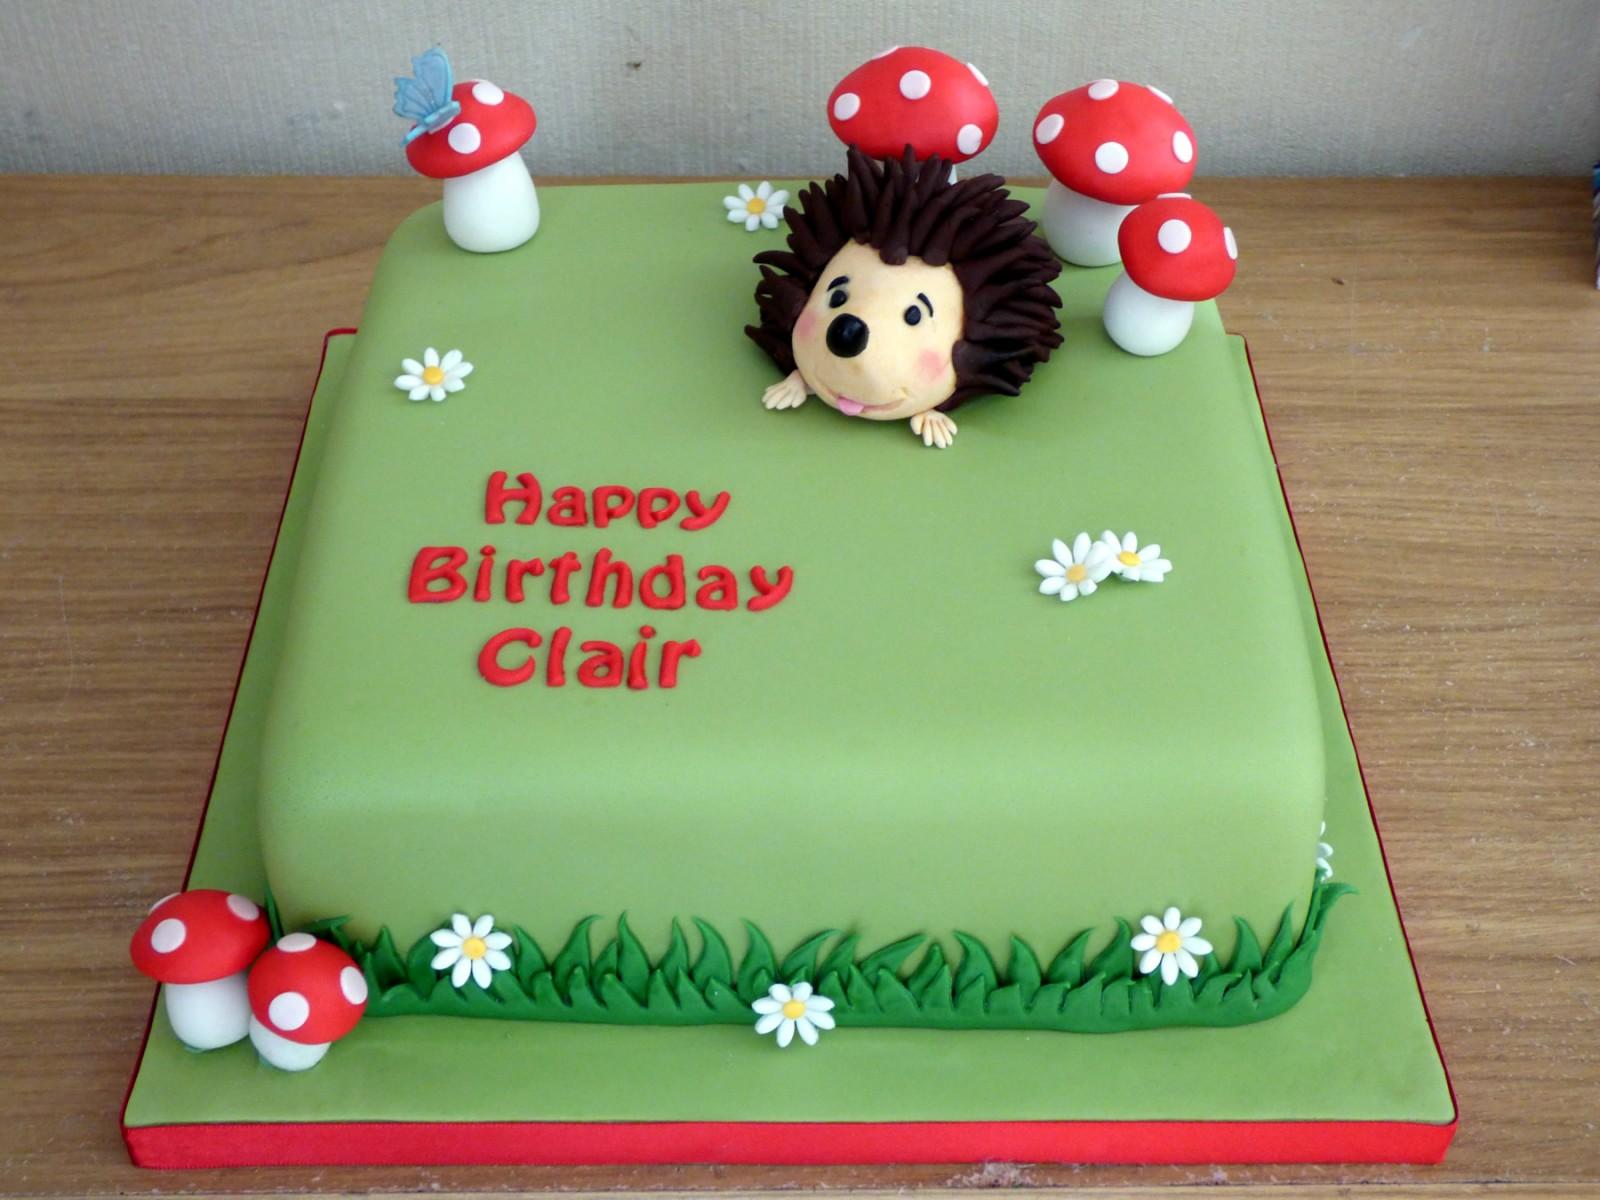 Strange Hedgehog Birthday Cake Susies Cakes Funny Birthday Cards Online Inifodamsfinfo